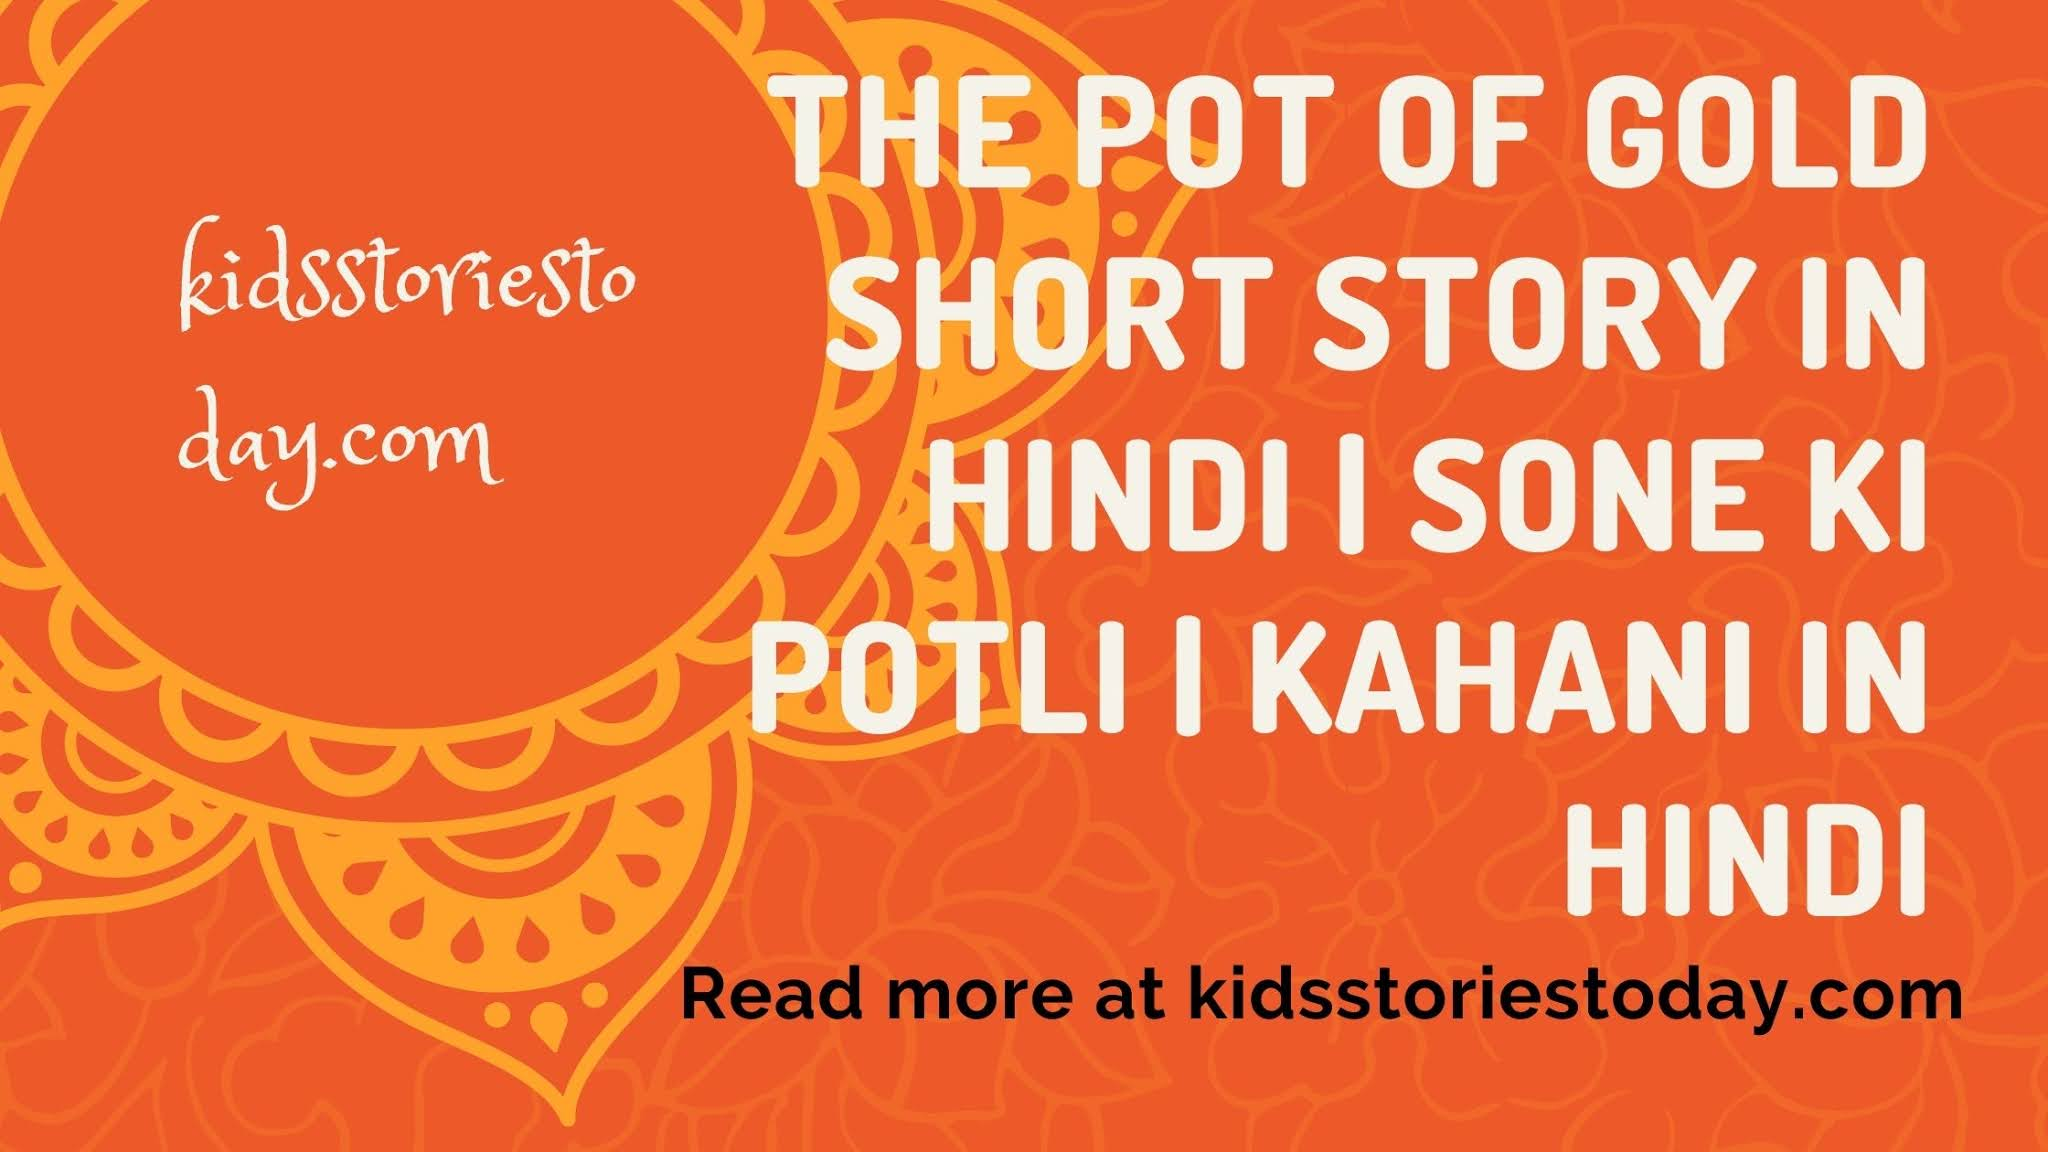 The Pot of Gold Short Story in Hindi  Sone Ki potli  Kahani in Hindi